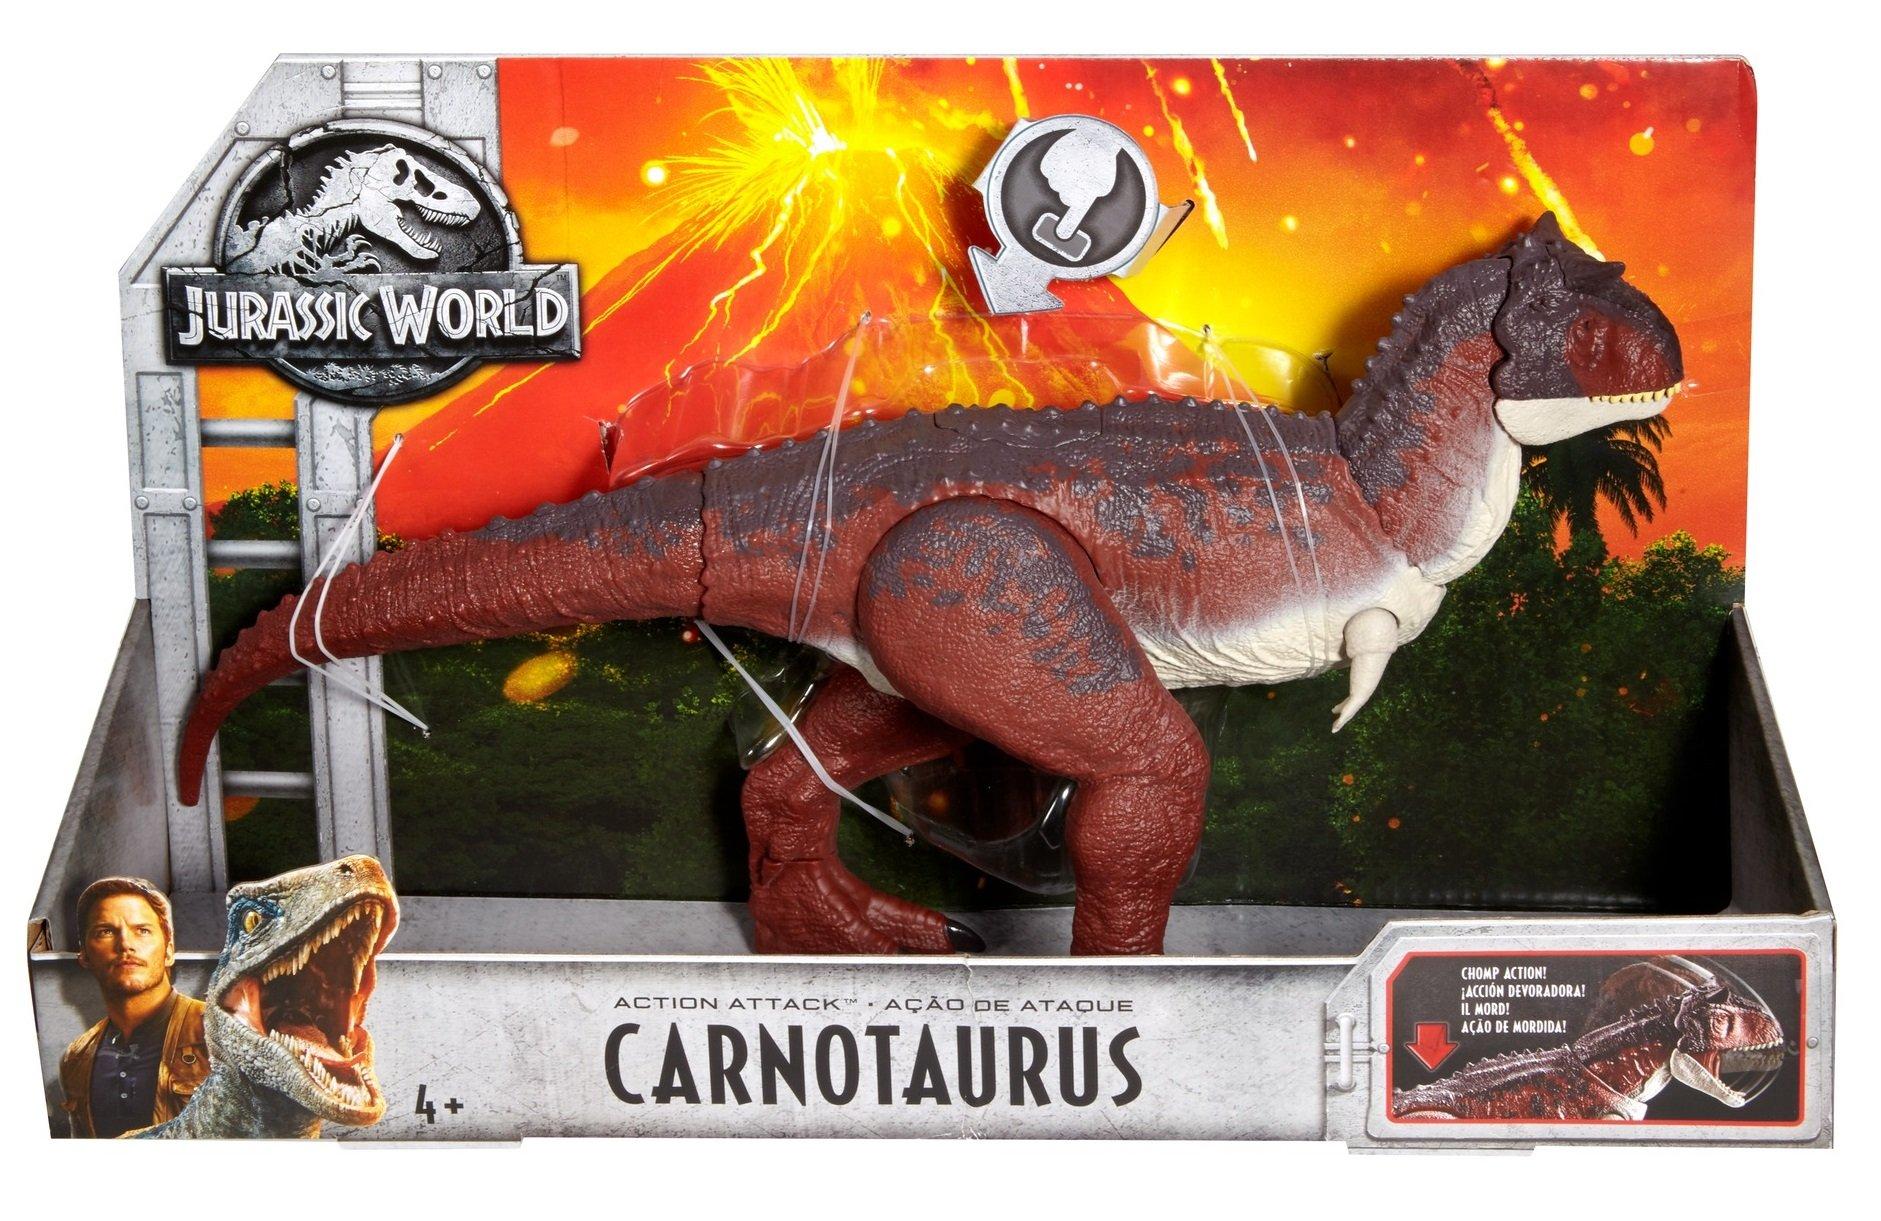 Jurassic World Action Attack Carnotaurus Figure by Jurassic World Toys (Image #5)